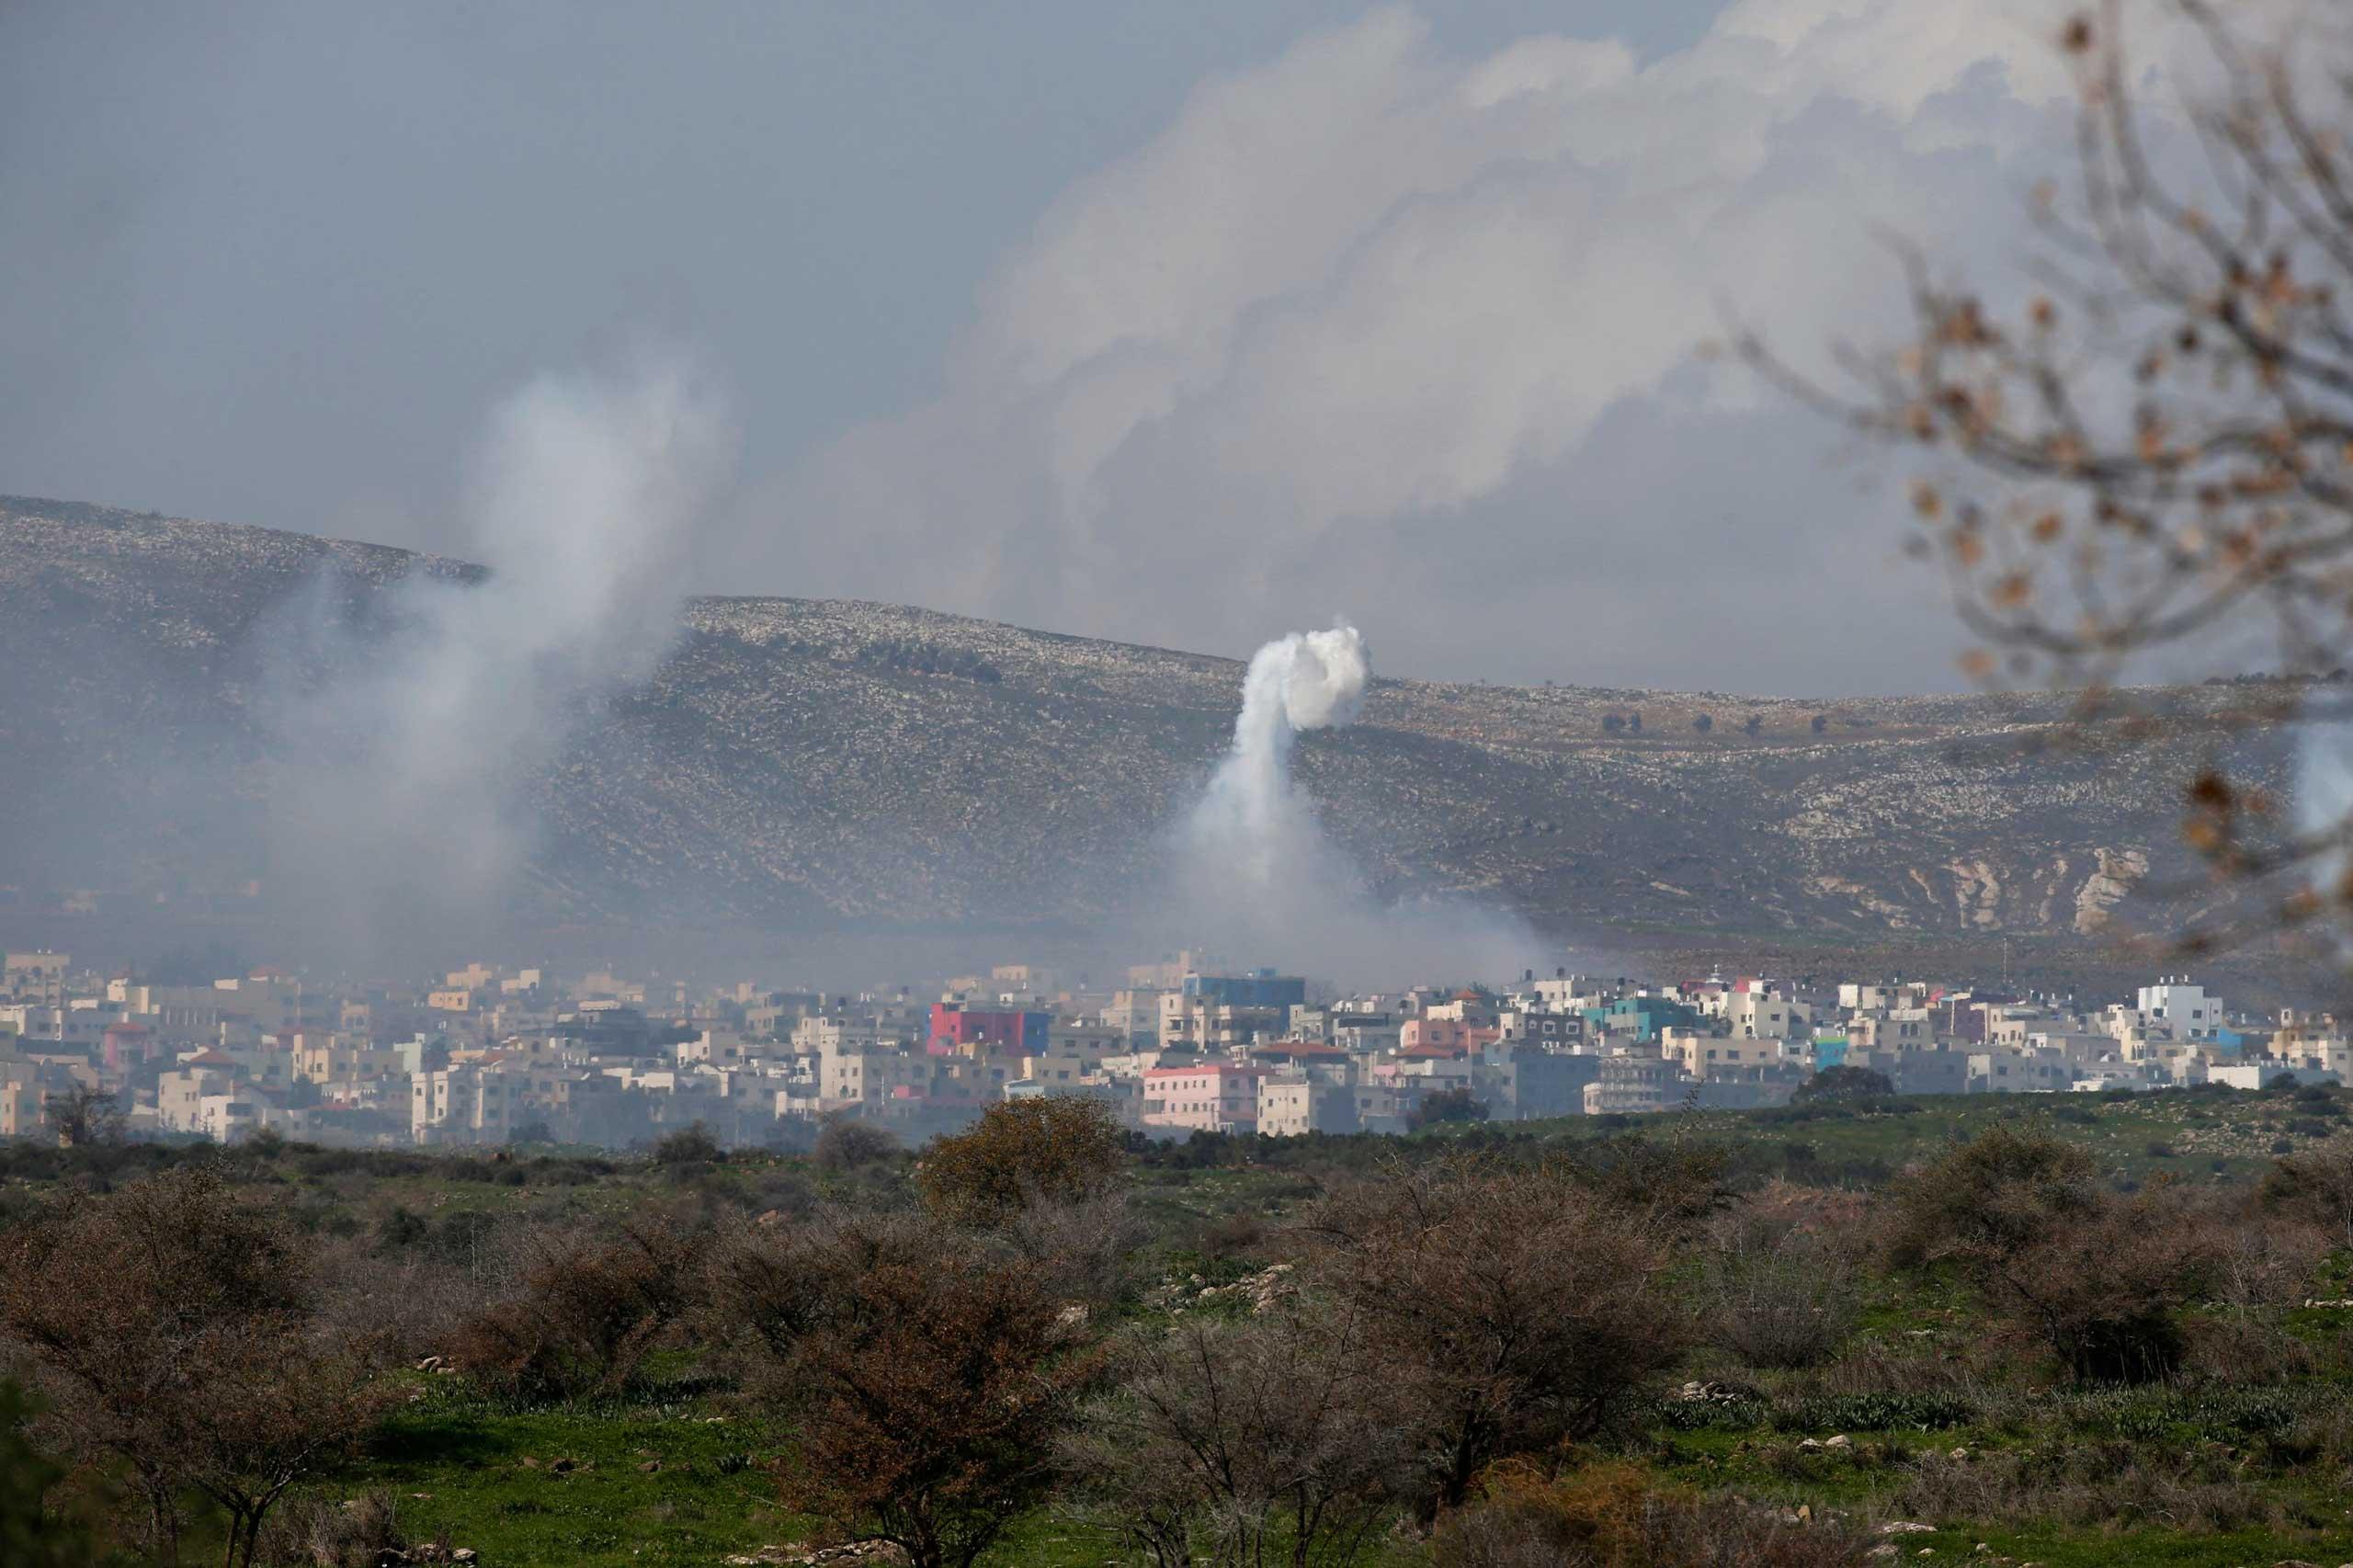 Smoke rises after an explosion in the Lebanese village of Ghajar on the Israeli-Lebanese border Jan. 28, 2015.